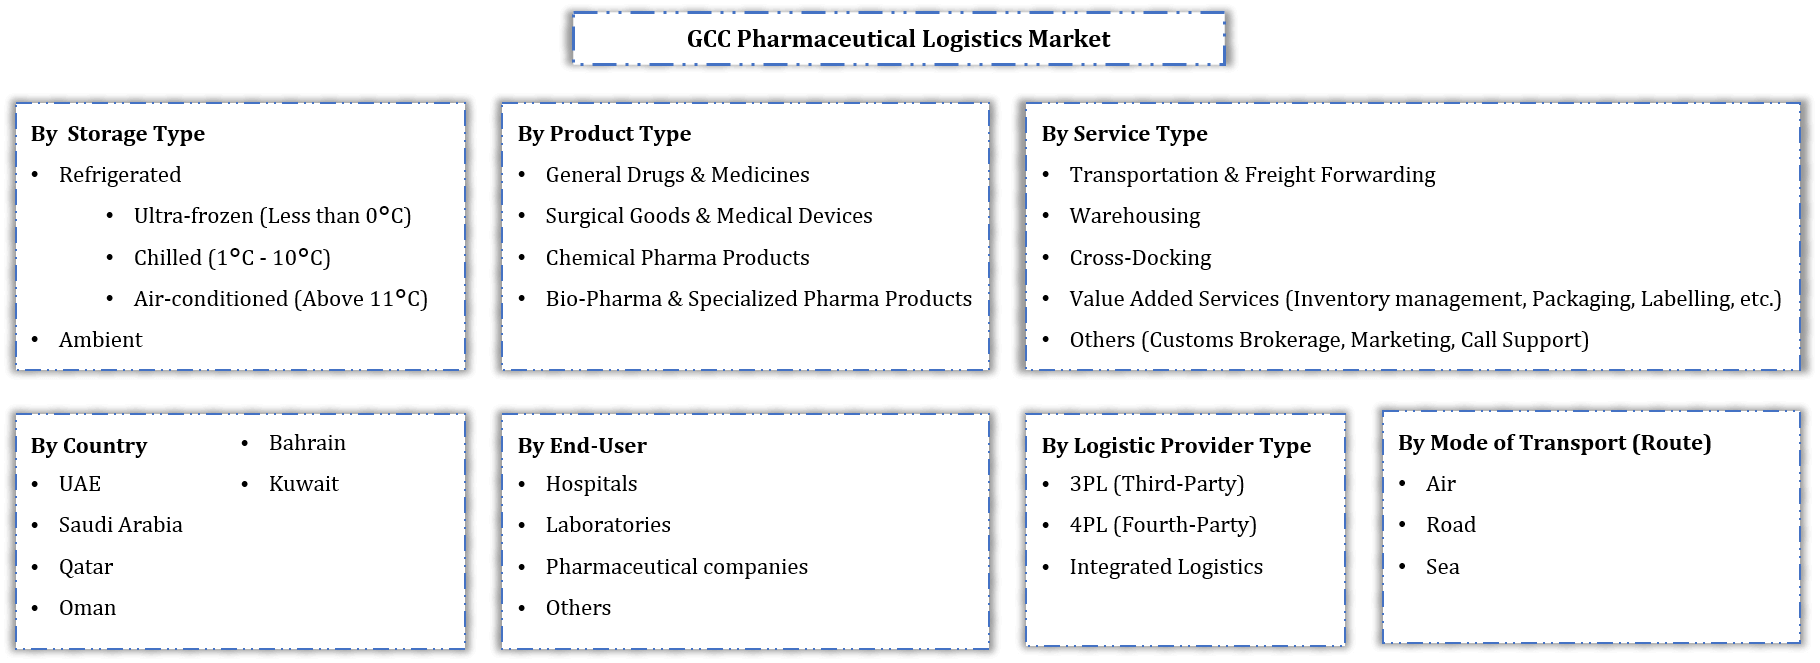 GCC Pharmaceutical Logistics Market Segmentation